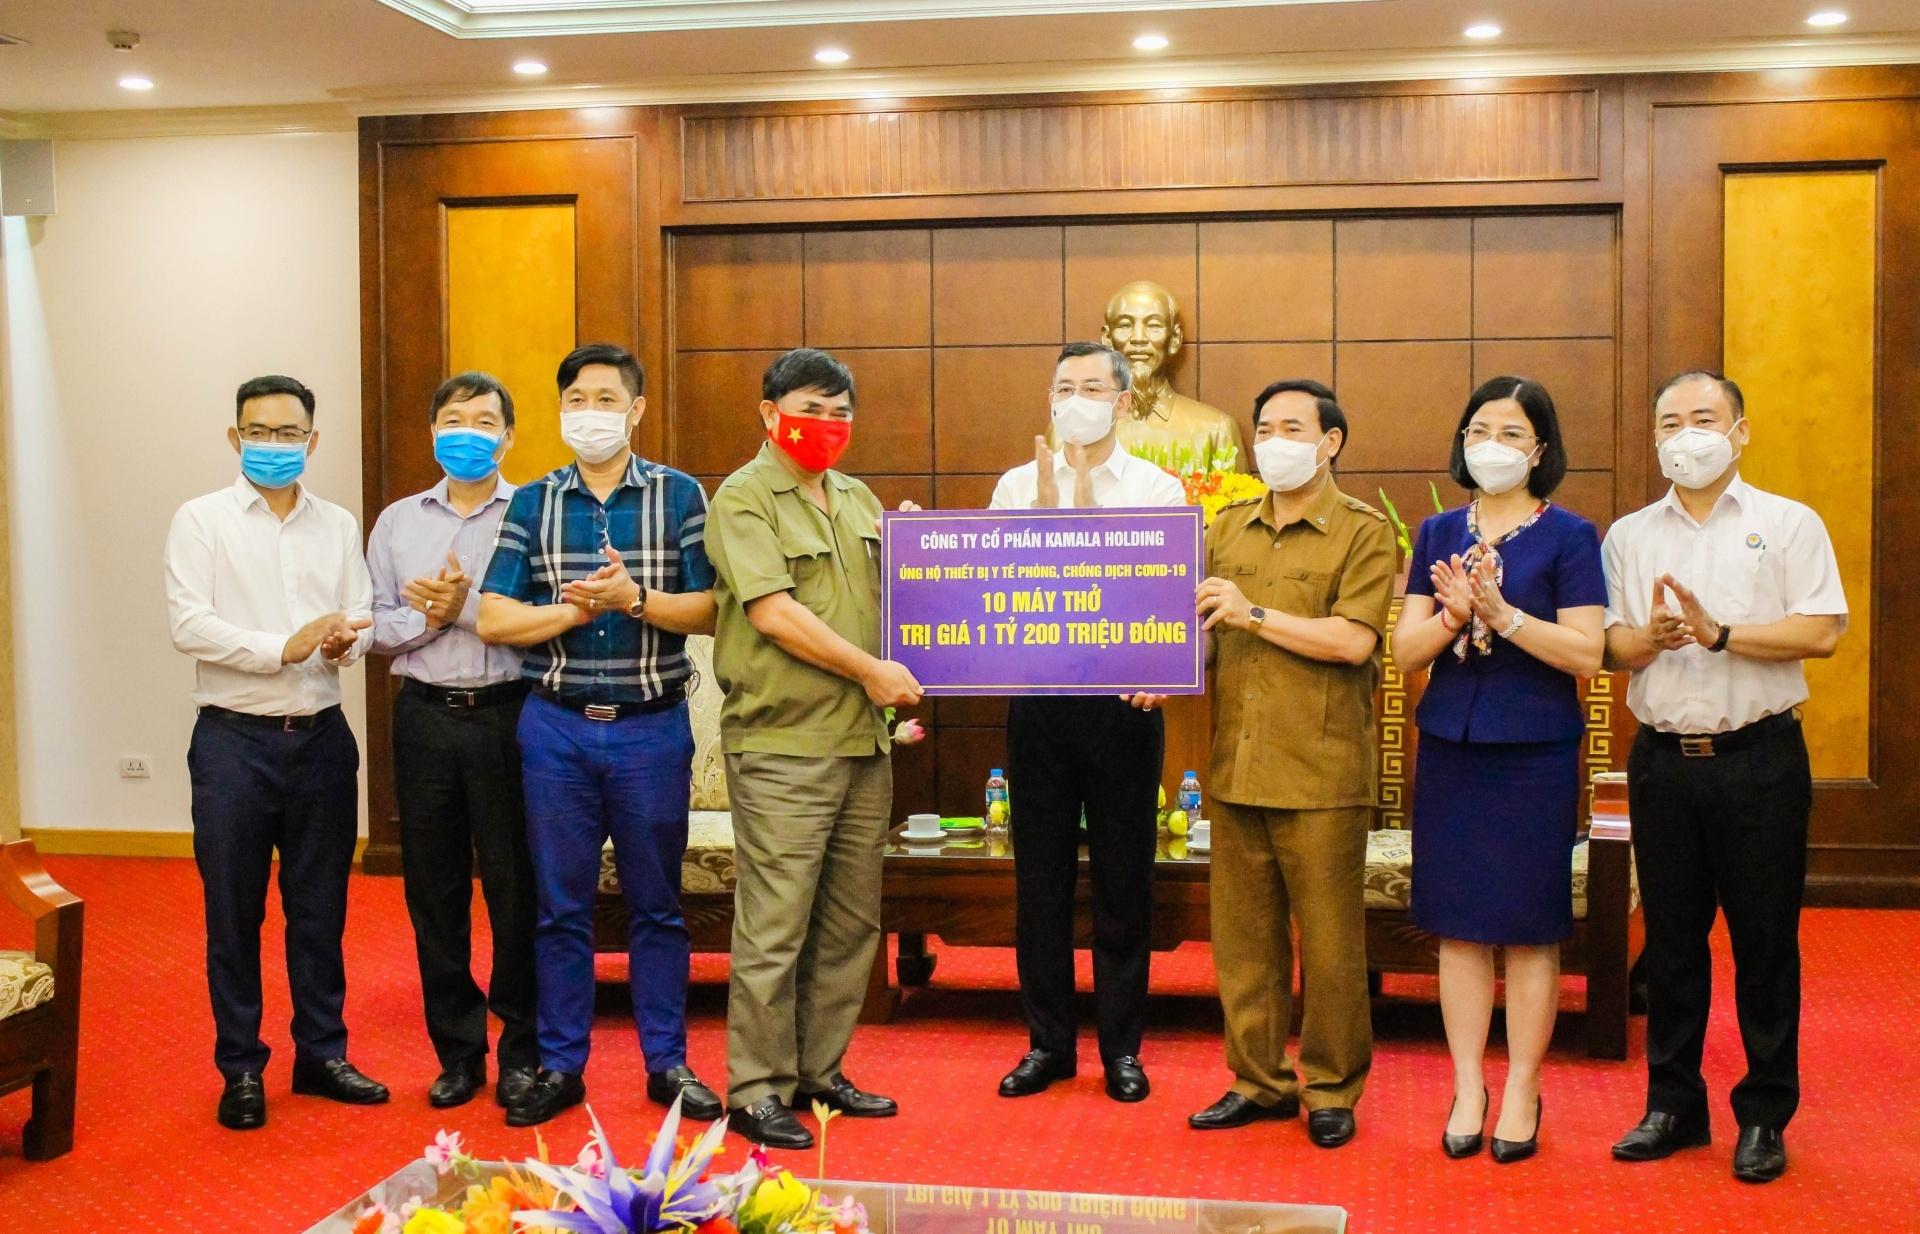 Kamala Holding donates 10 ventilators to support Hoa Binh province in tackling pandemic